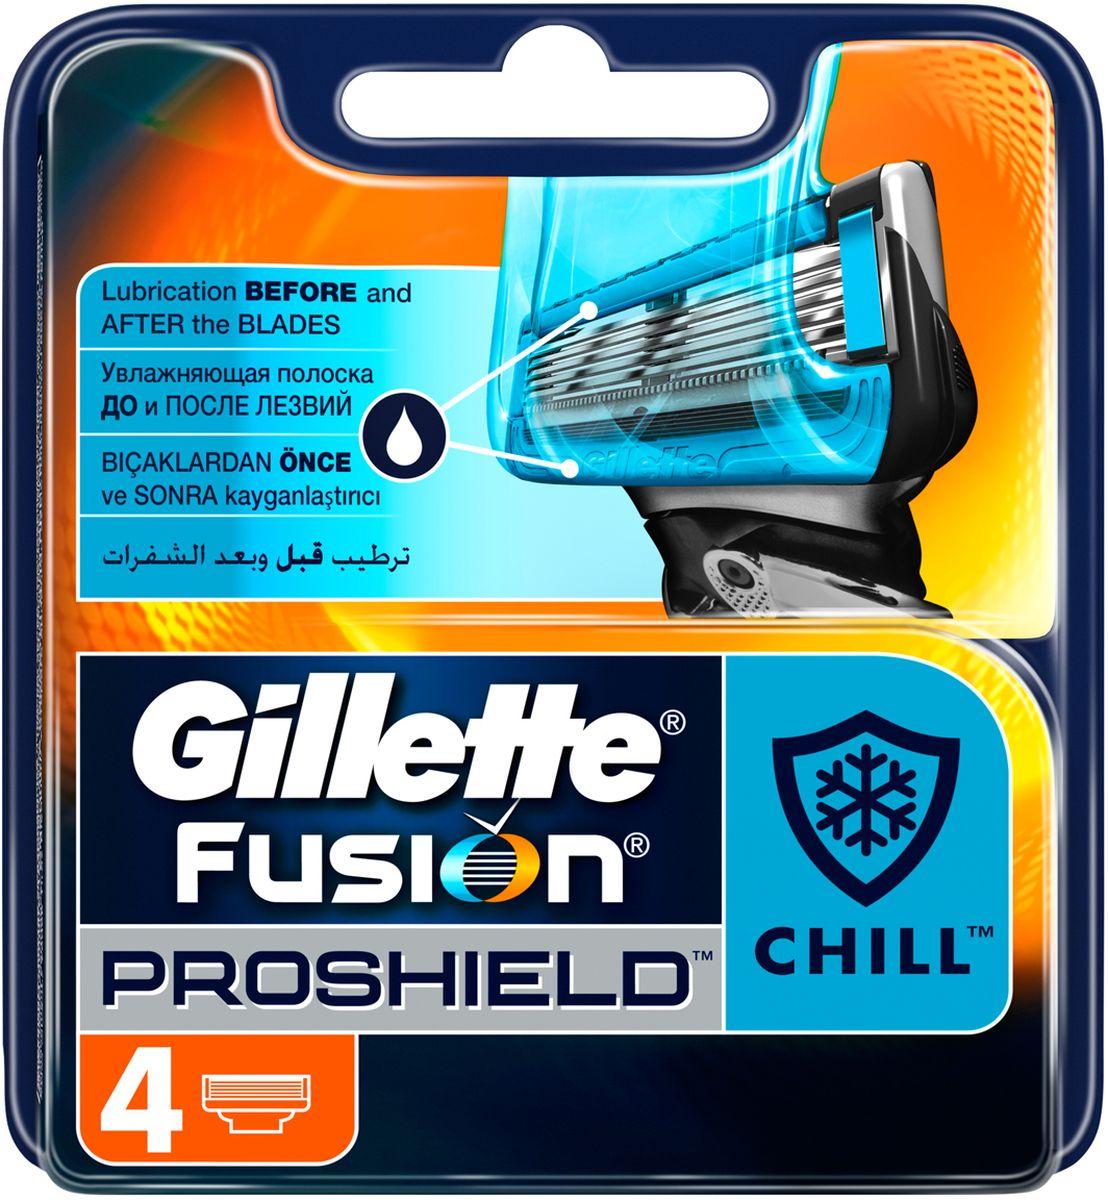 Gillette Сменные кассеты для мужской бритвы Fusion ProShield Chill, 4шт